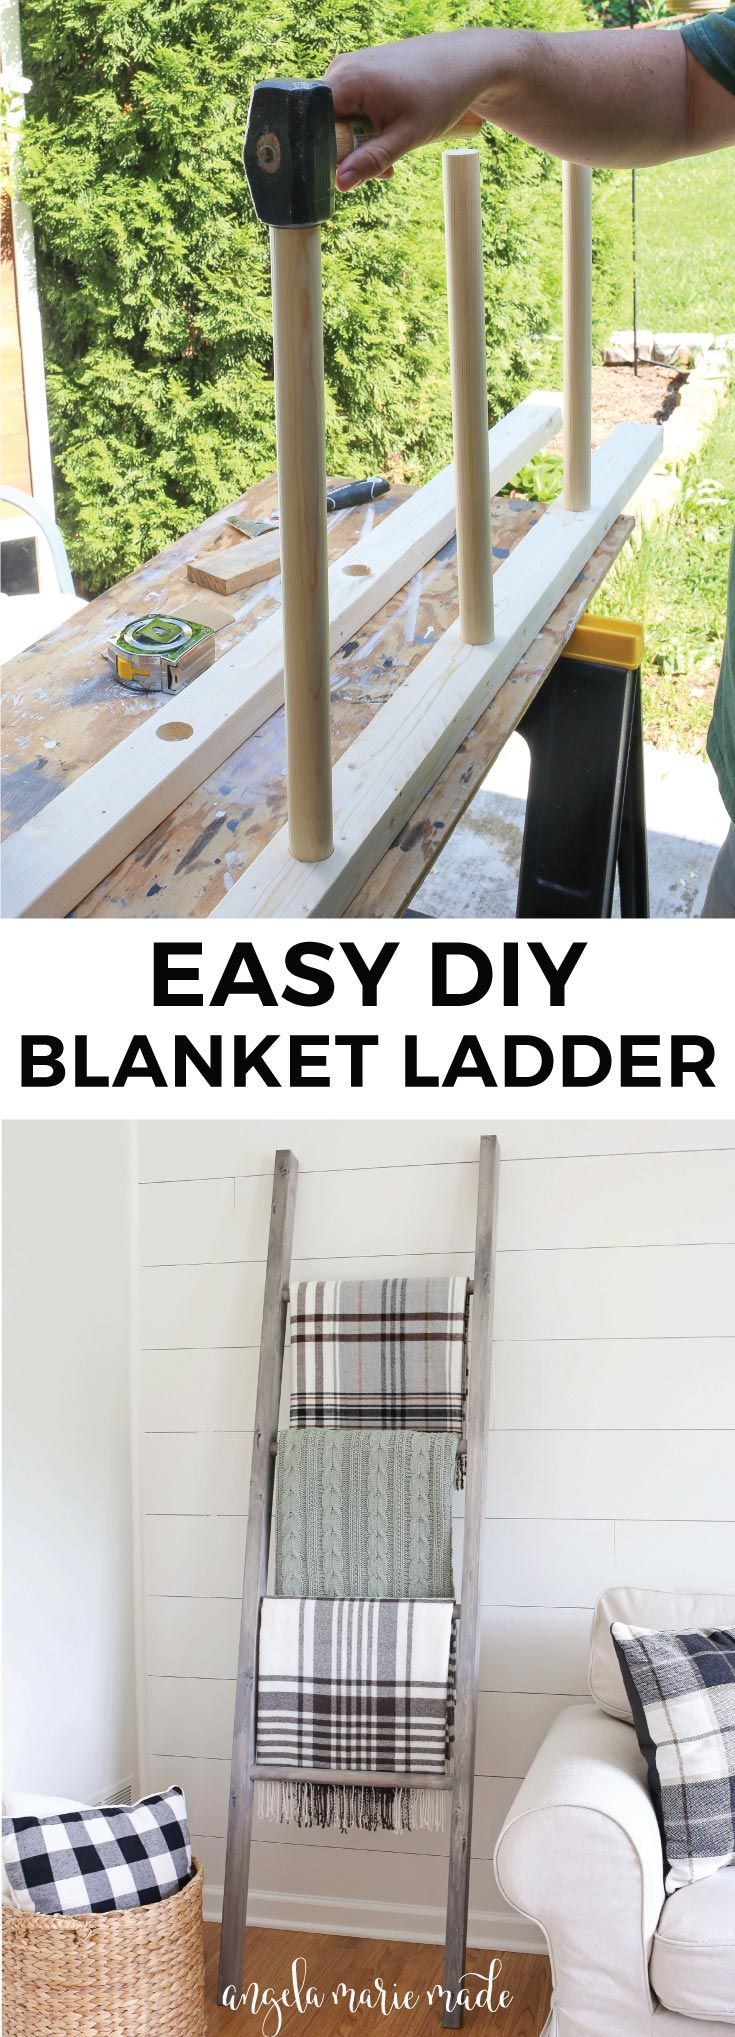 Easy diy blanket ladder diy projects pinterest living room